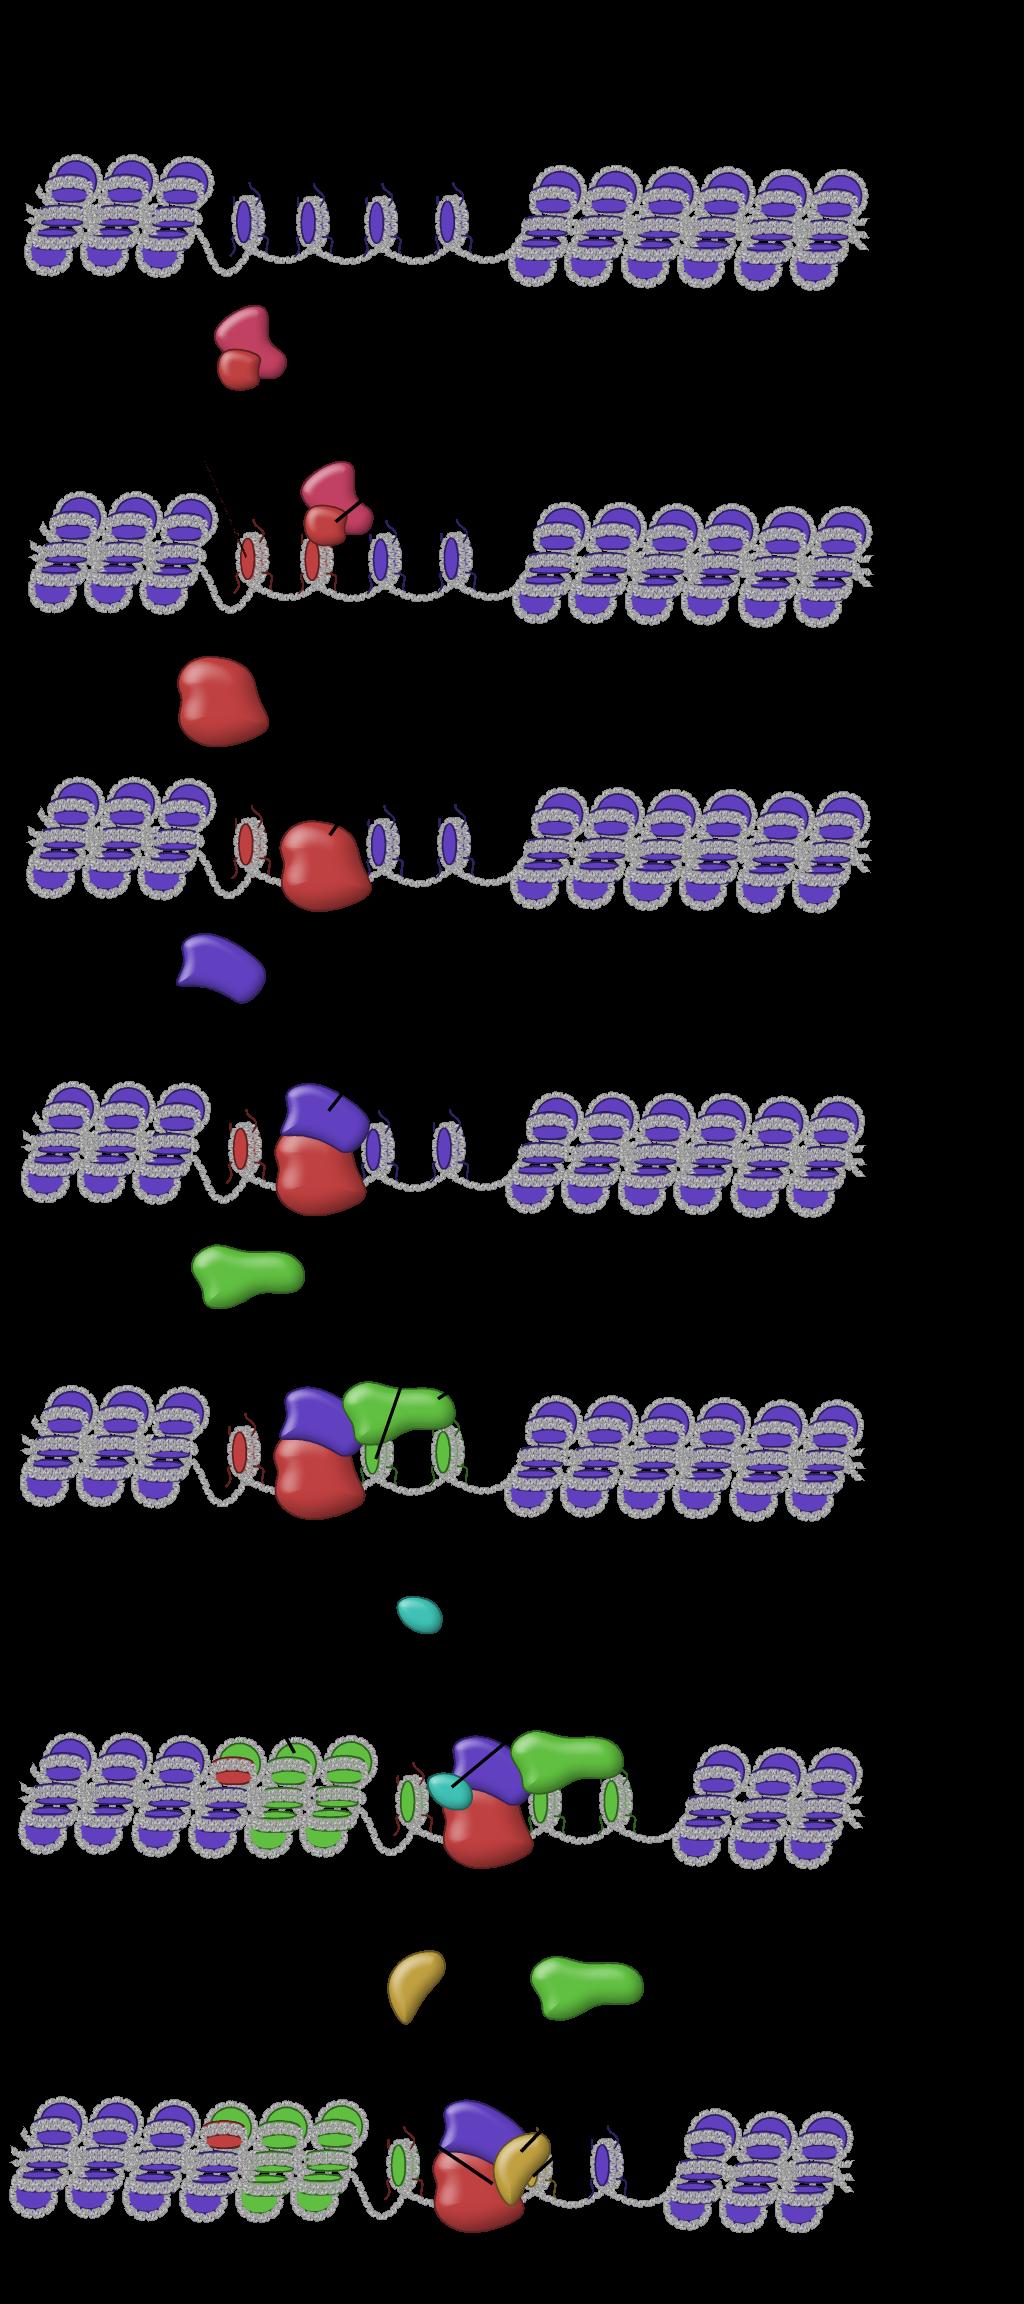 Chromatid Structure